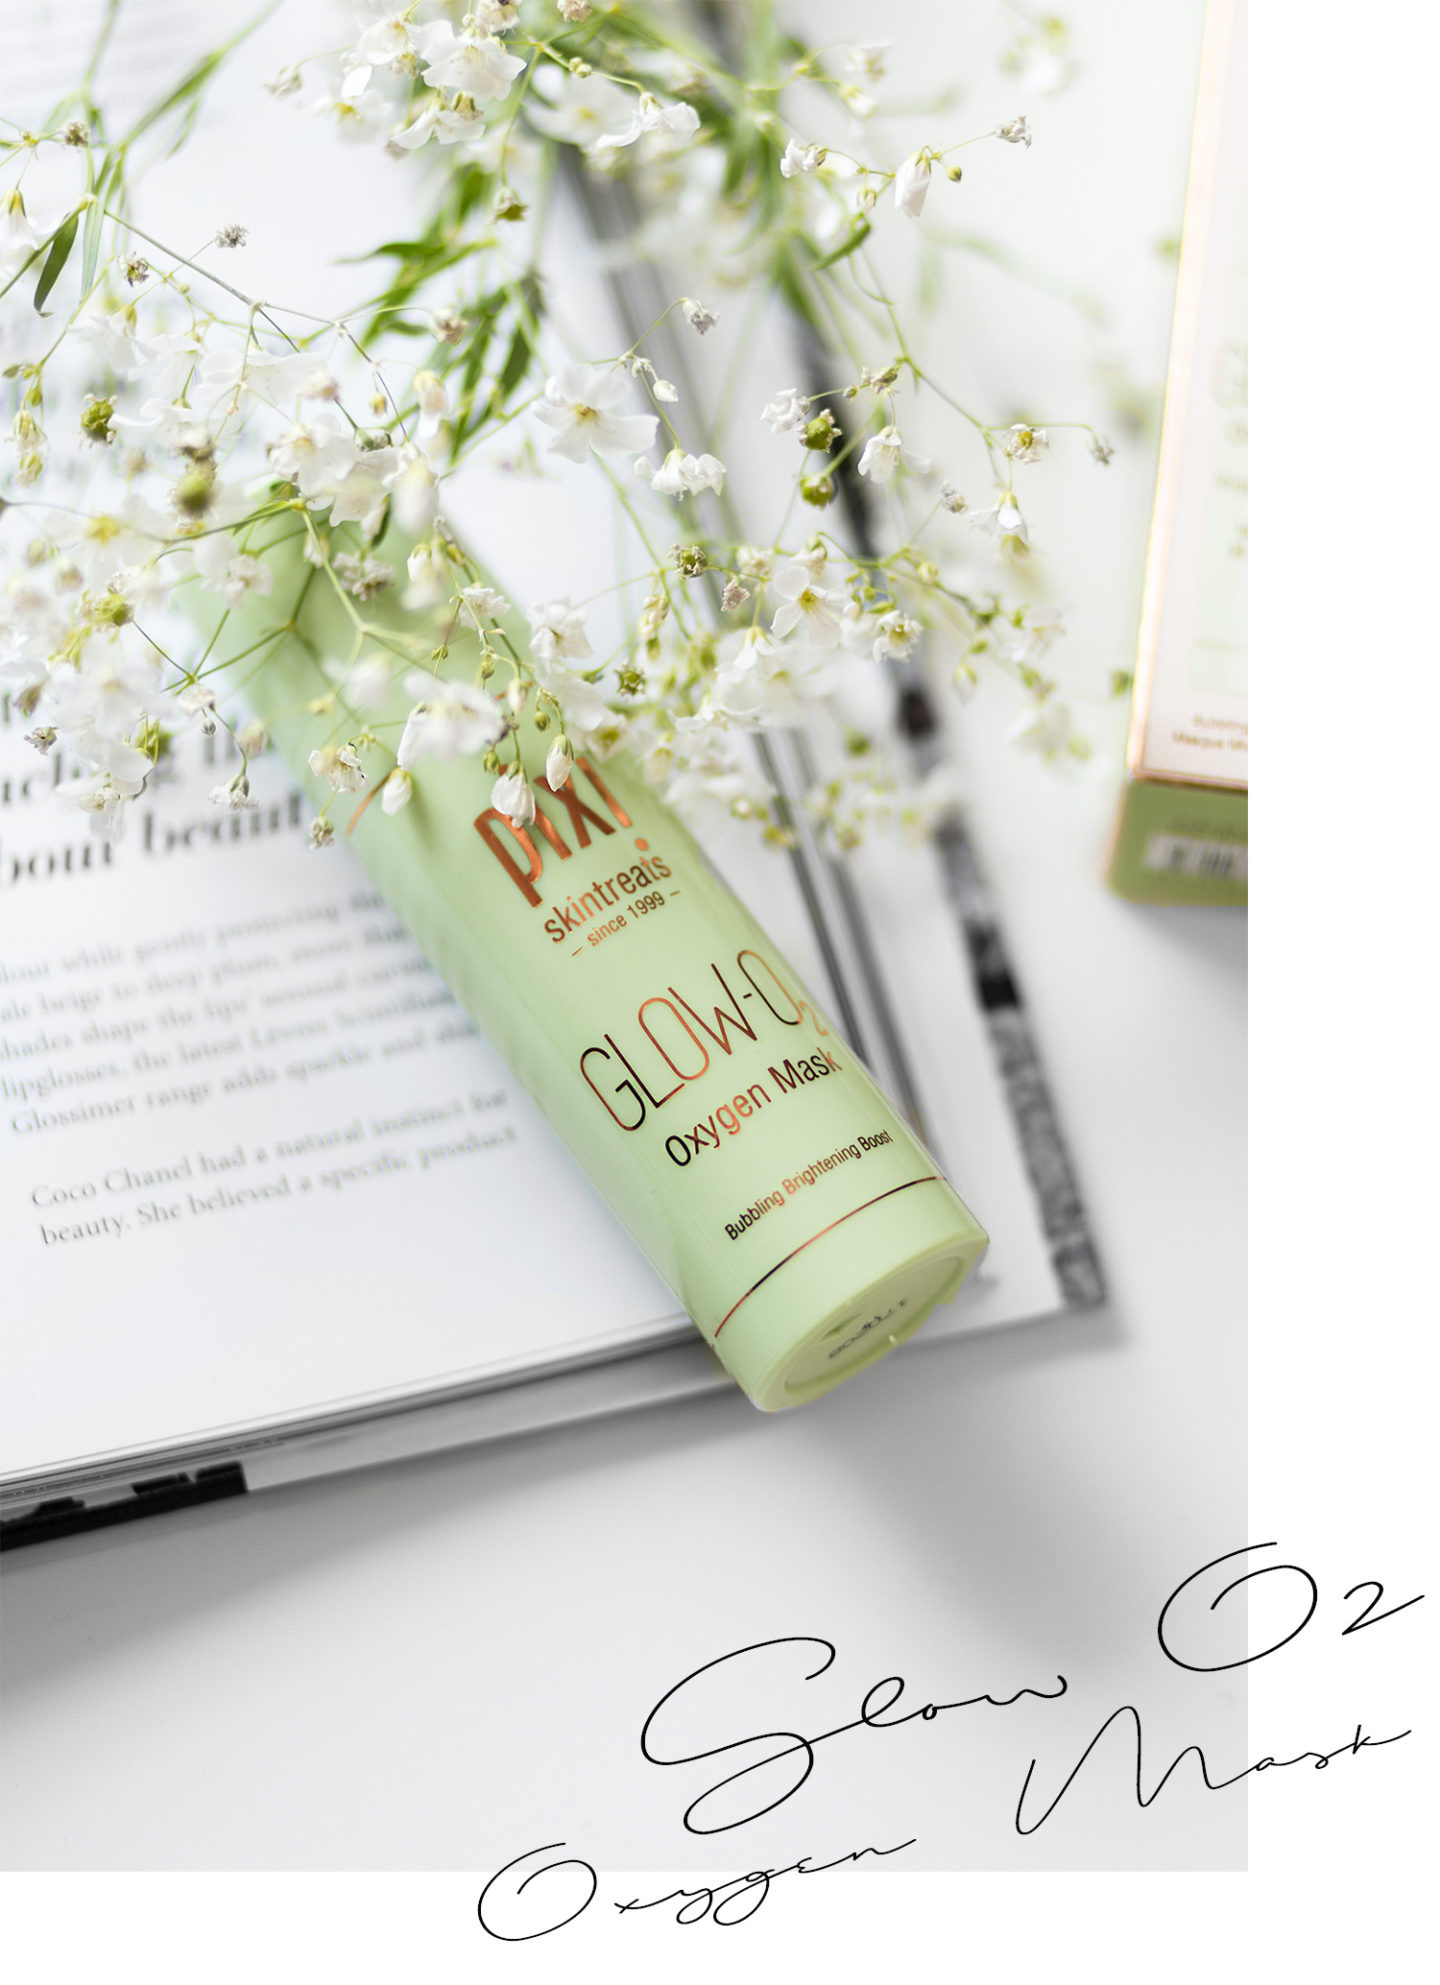 neuheiten-von pixi-glow-o2-oxygen-mask-beauty-skincare-review-test-erfahrung-strahlende-haut-sommer-bezauberndenana